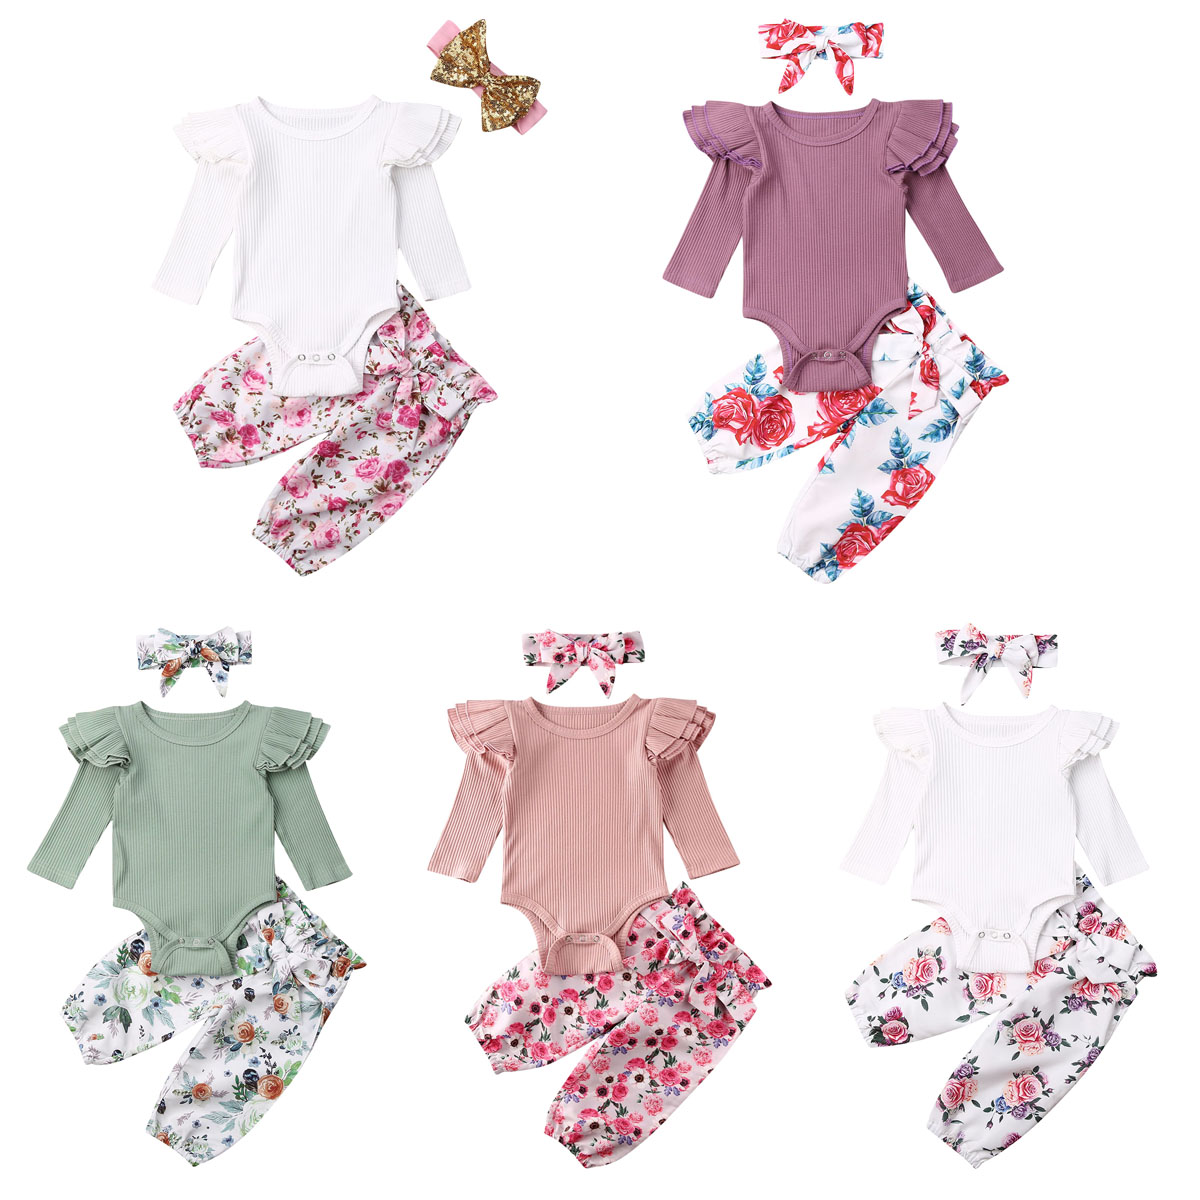 Newborn Infant Baby Girl Floral Outfit Kids Romper Top+Pants+Headband 3PCS Set